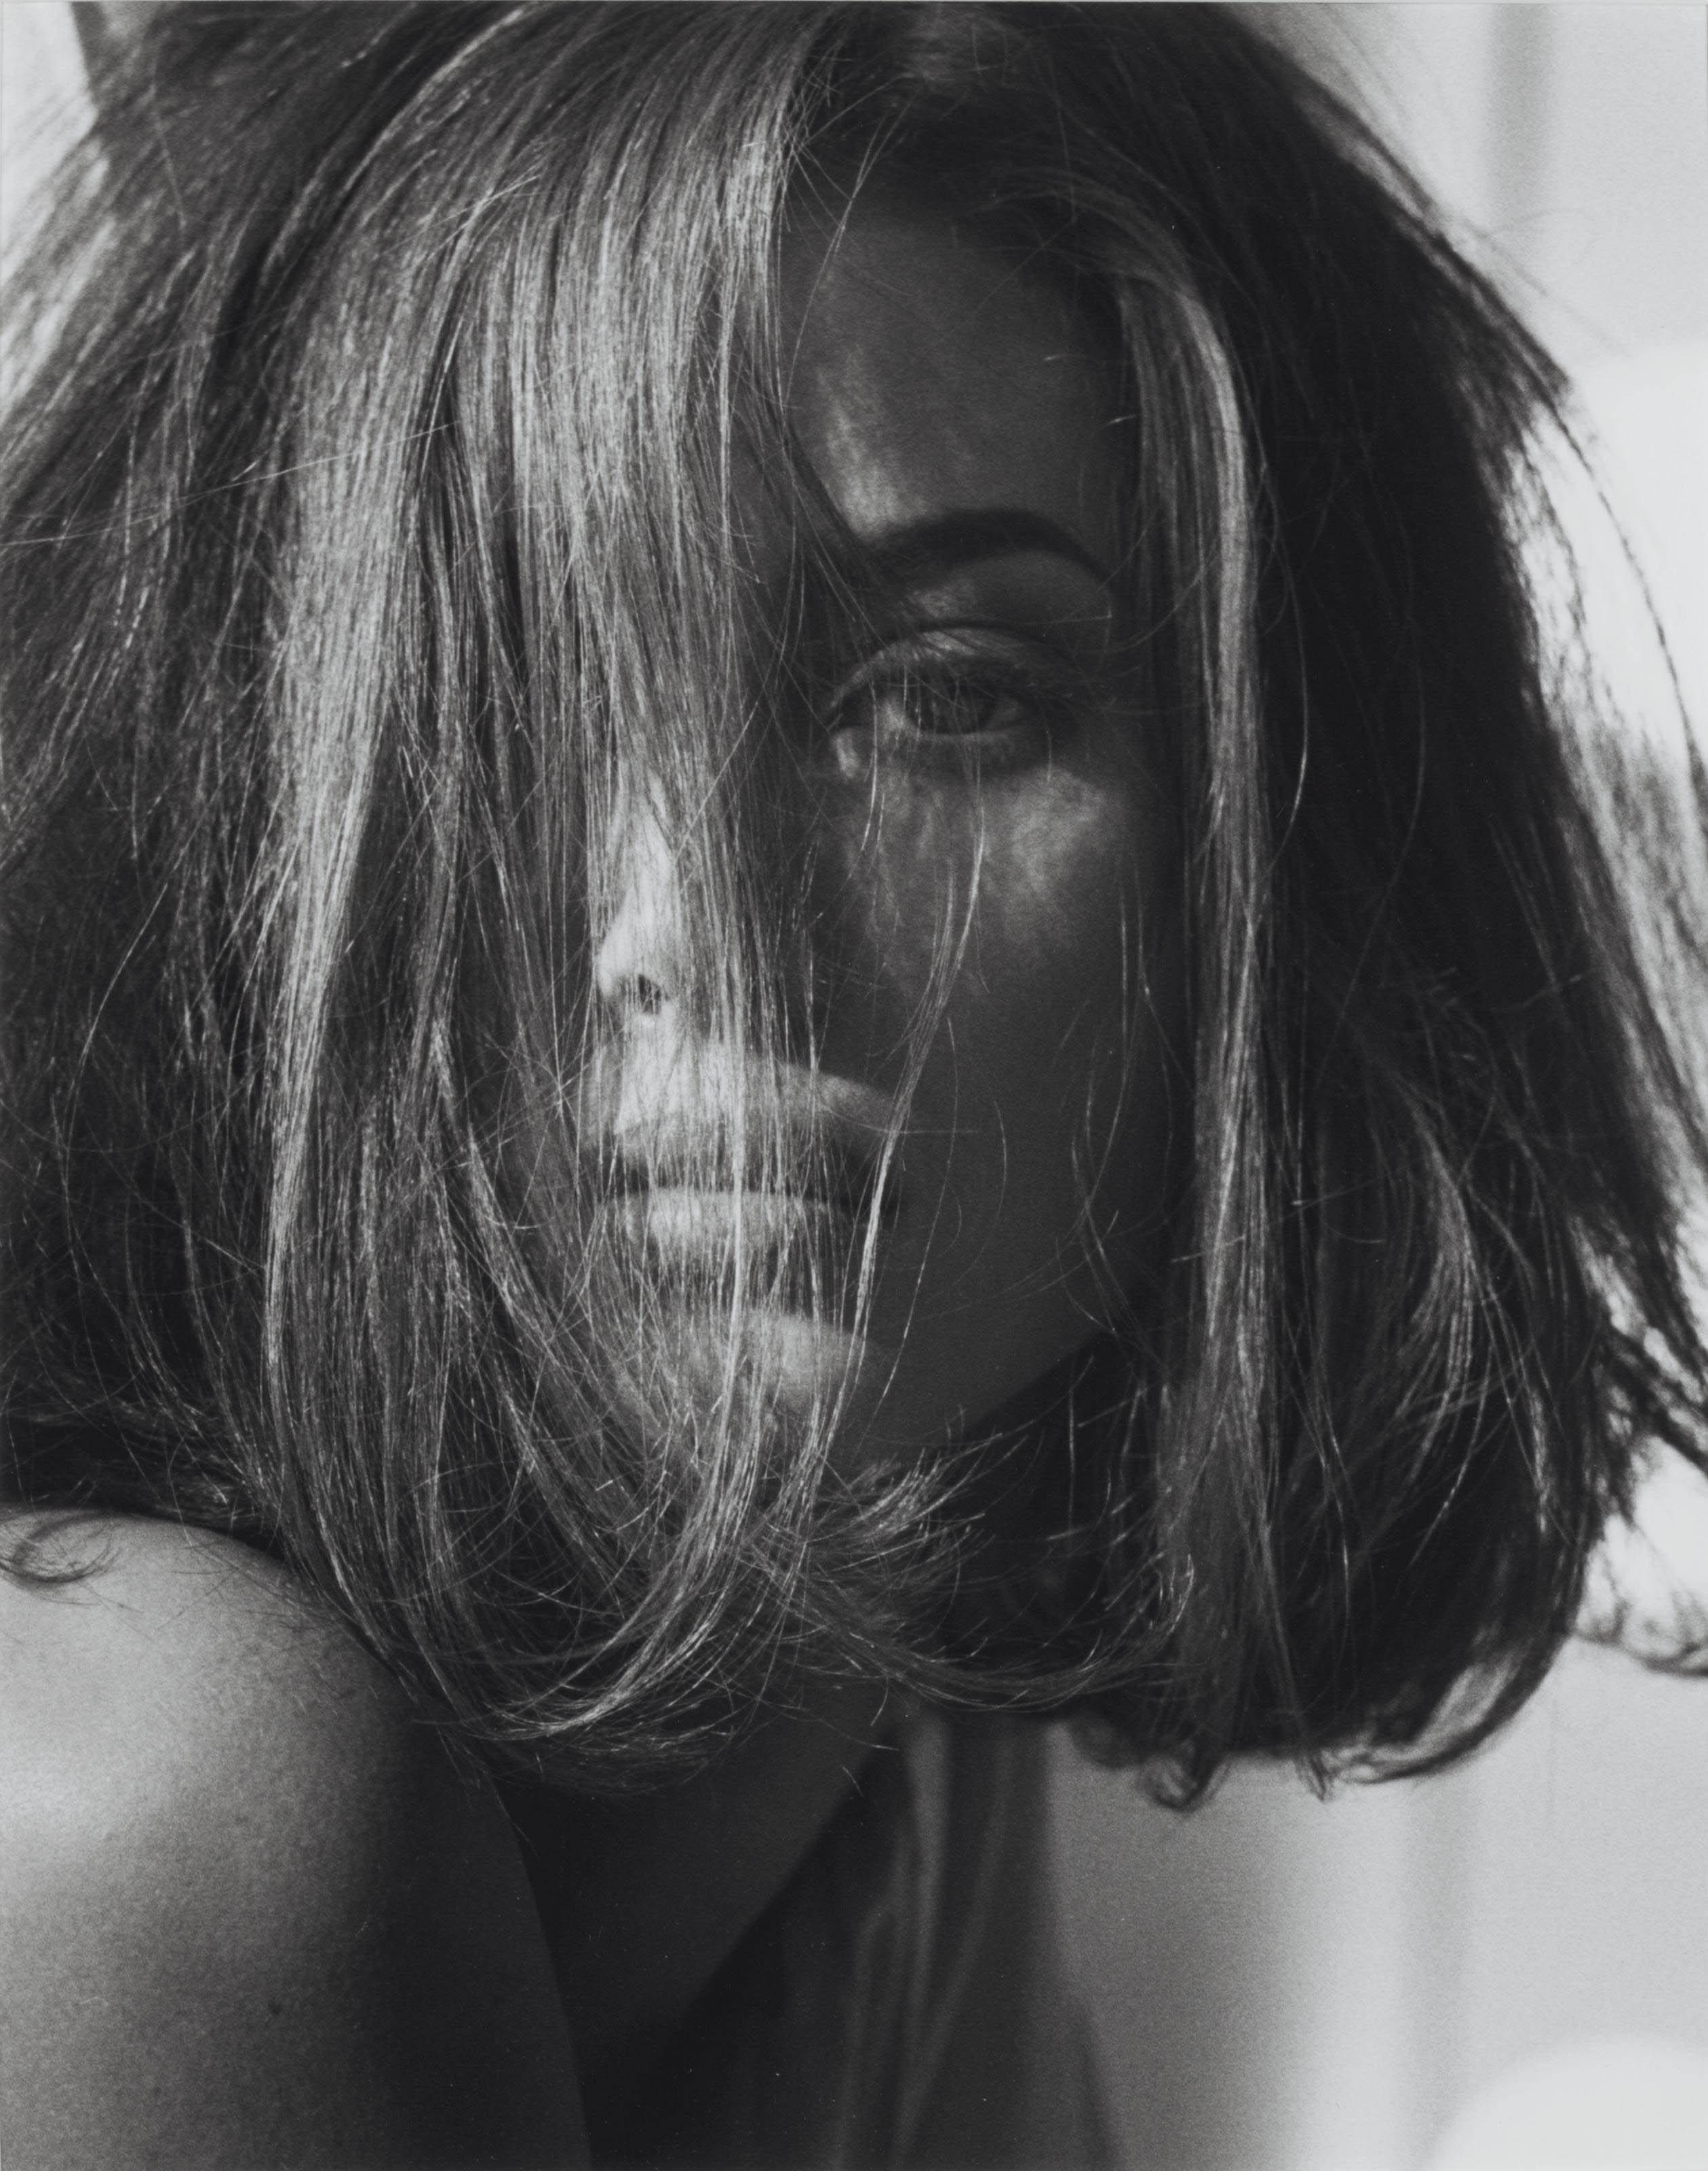 Christy Turlington, for 'Italian Vogue', 1989